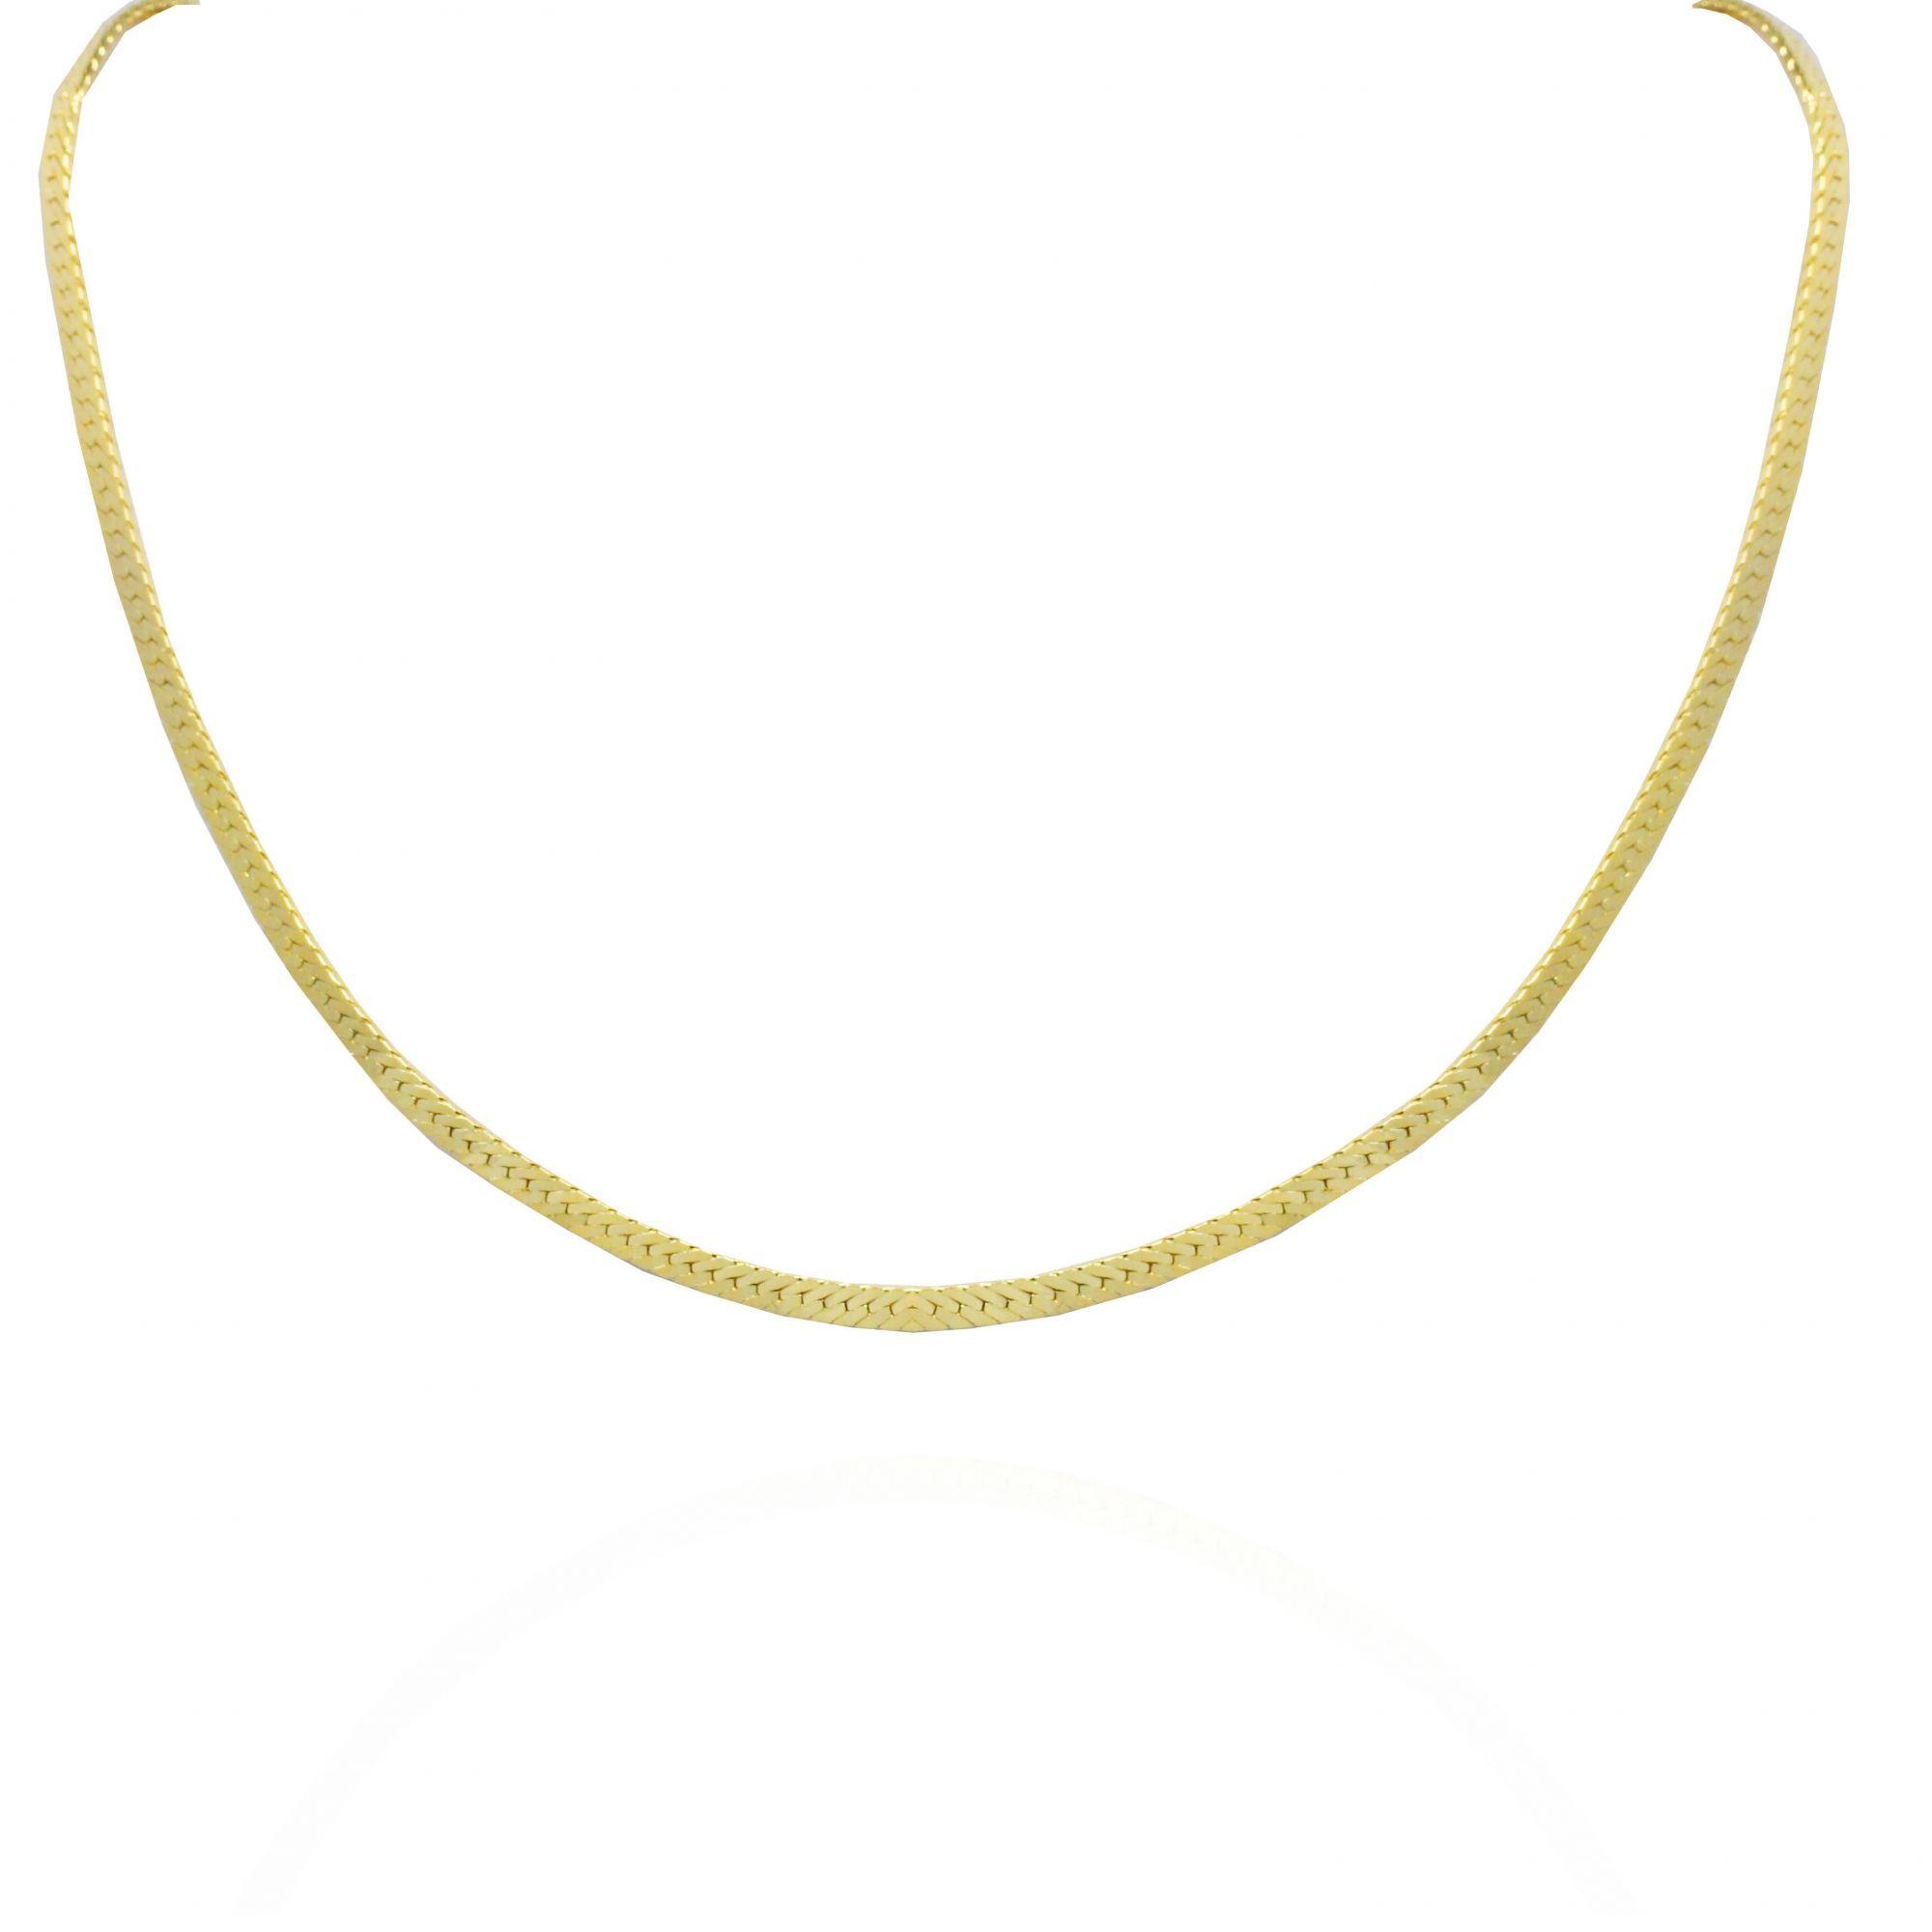 Colar Malha Serpente Folheado Ouro 18k - Lunozê Joias eec8d197db